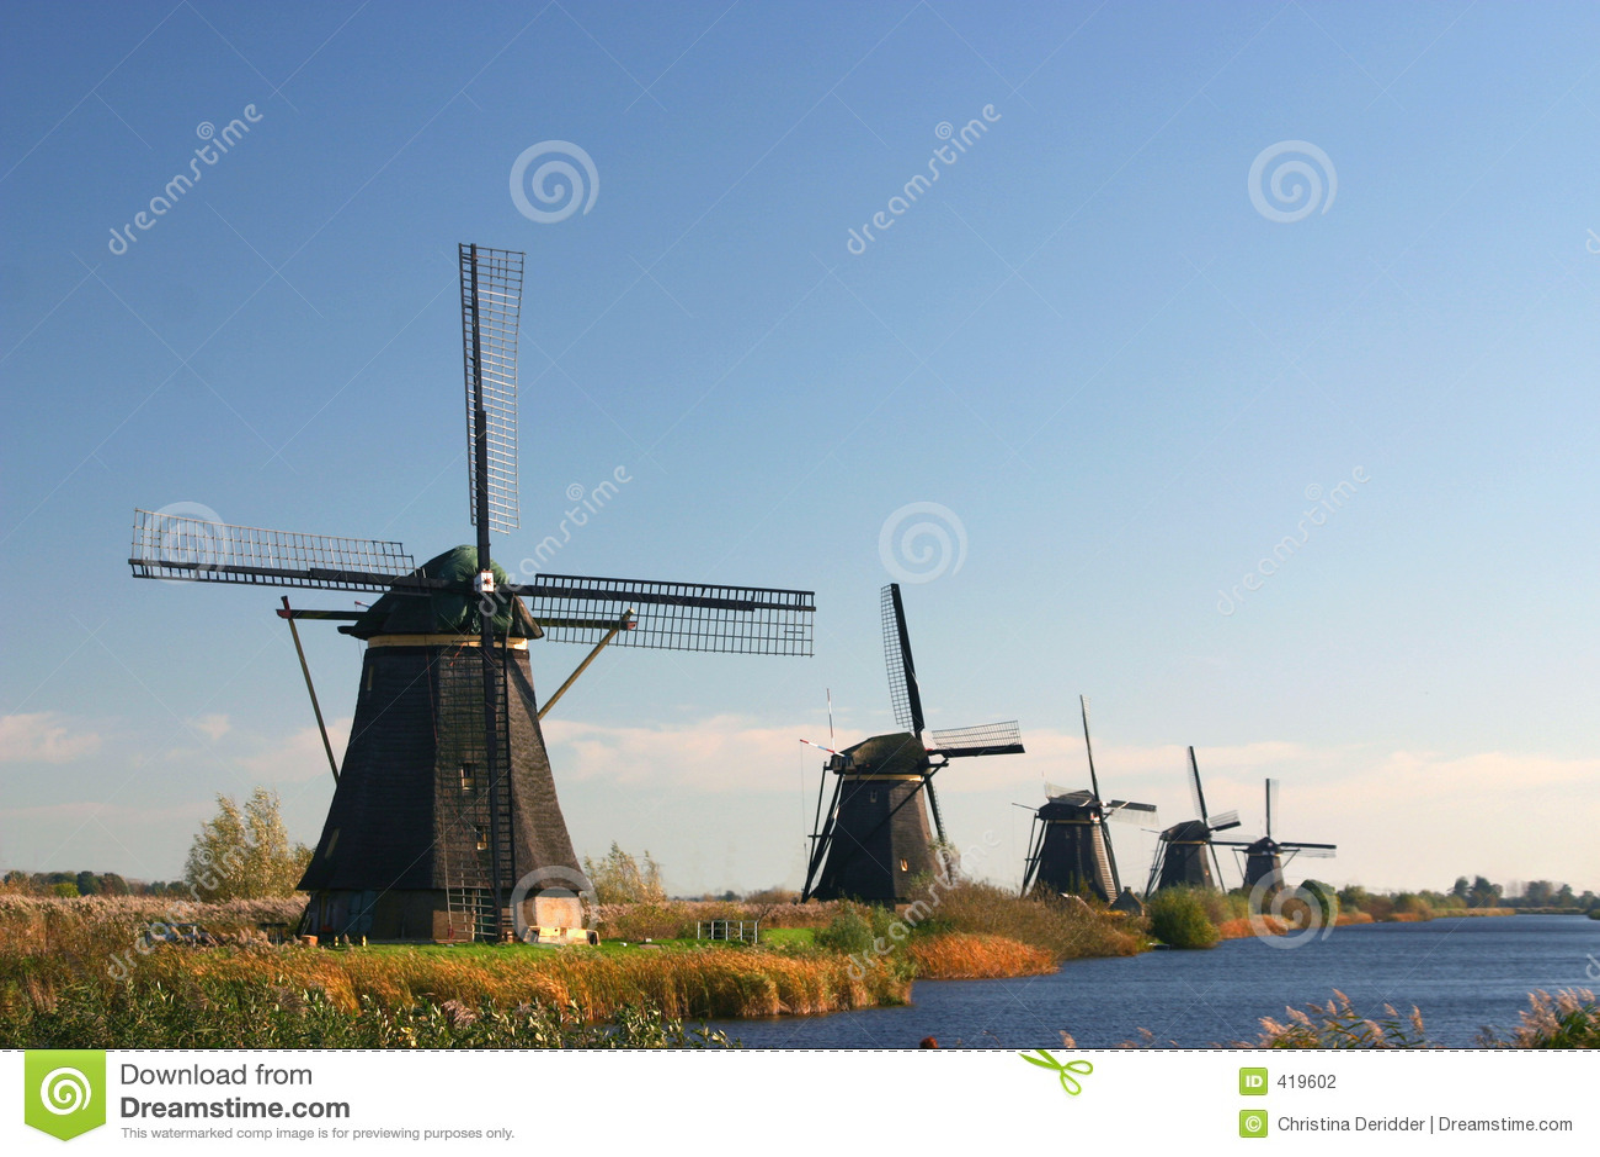 A row of Windmills